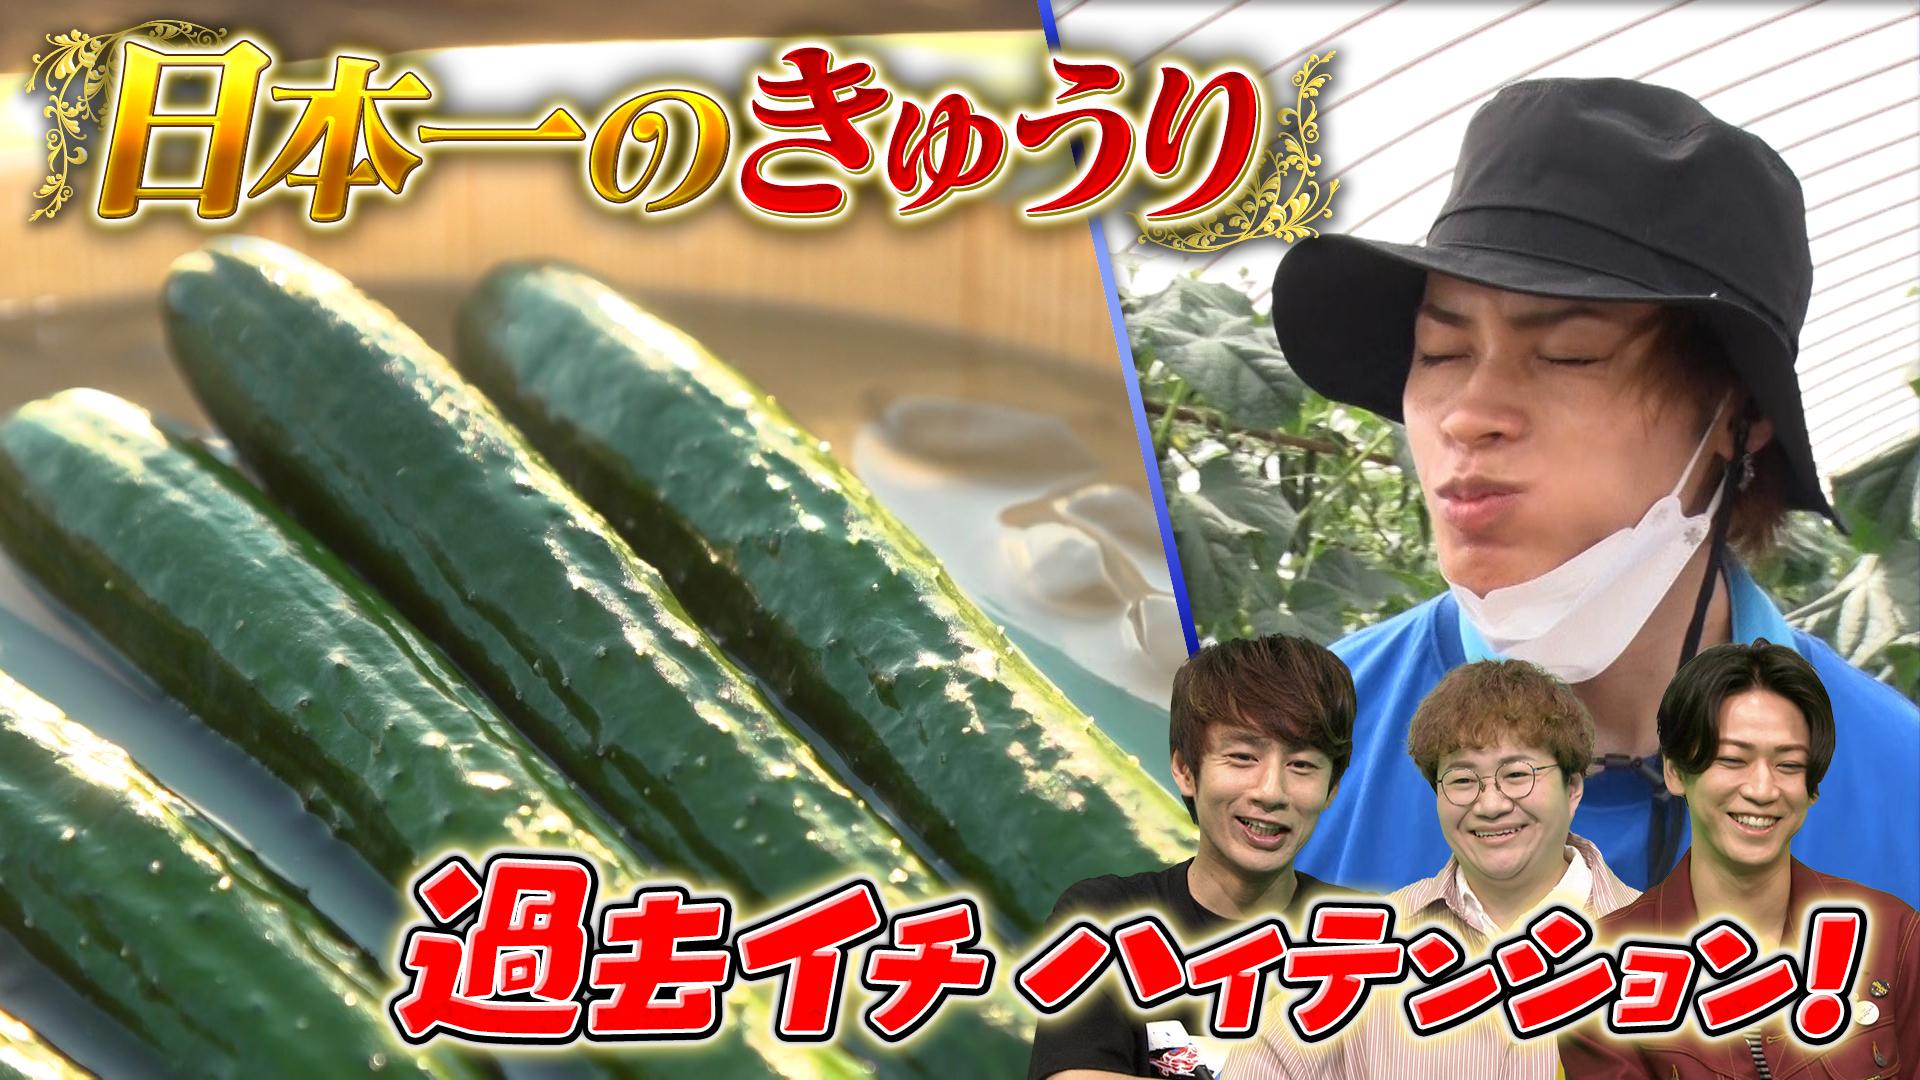 KAT-TUNの食宝ゲッットゥーン #21 上田、日本一のきゅうりに大興奮SP!